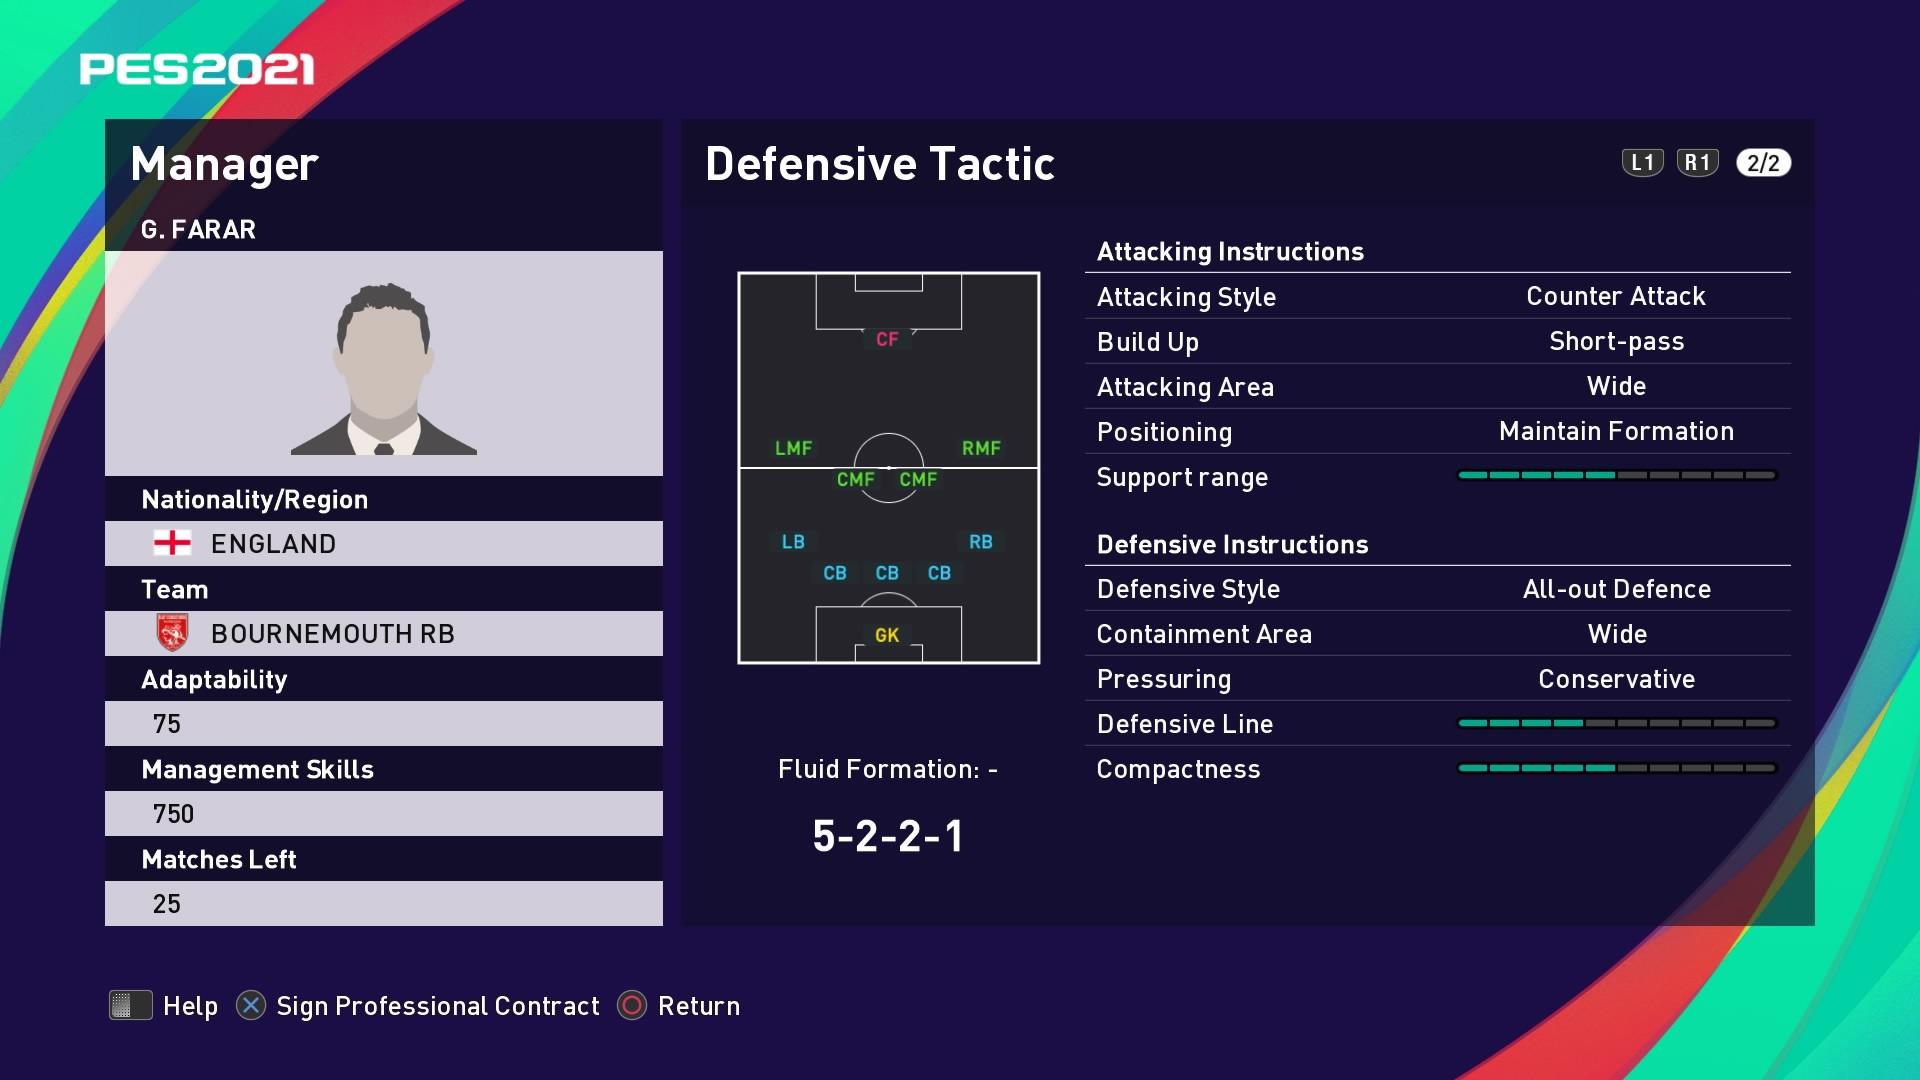 G. Farar (Jason Tindall) Defensive Tactic in PES 2021 myClub